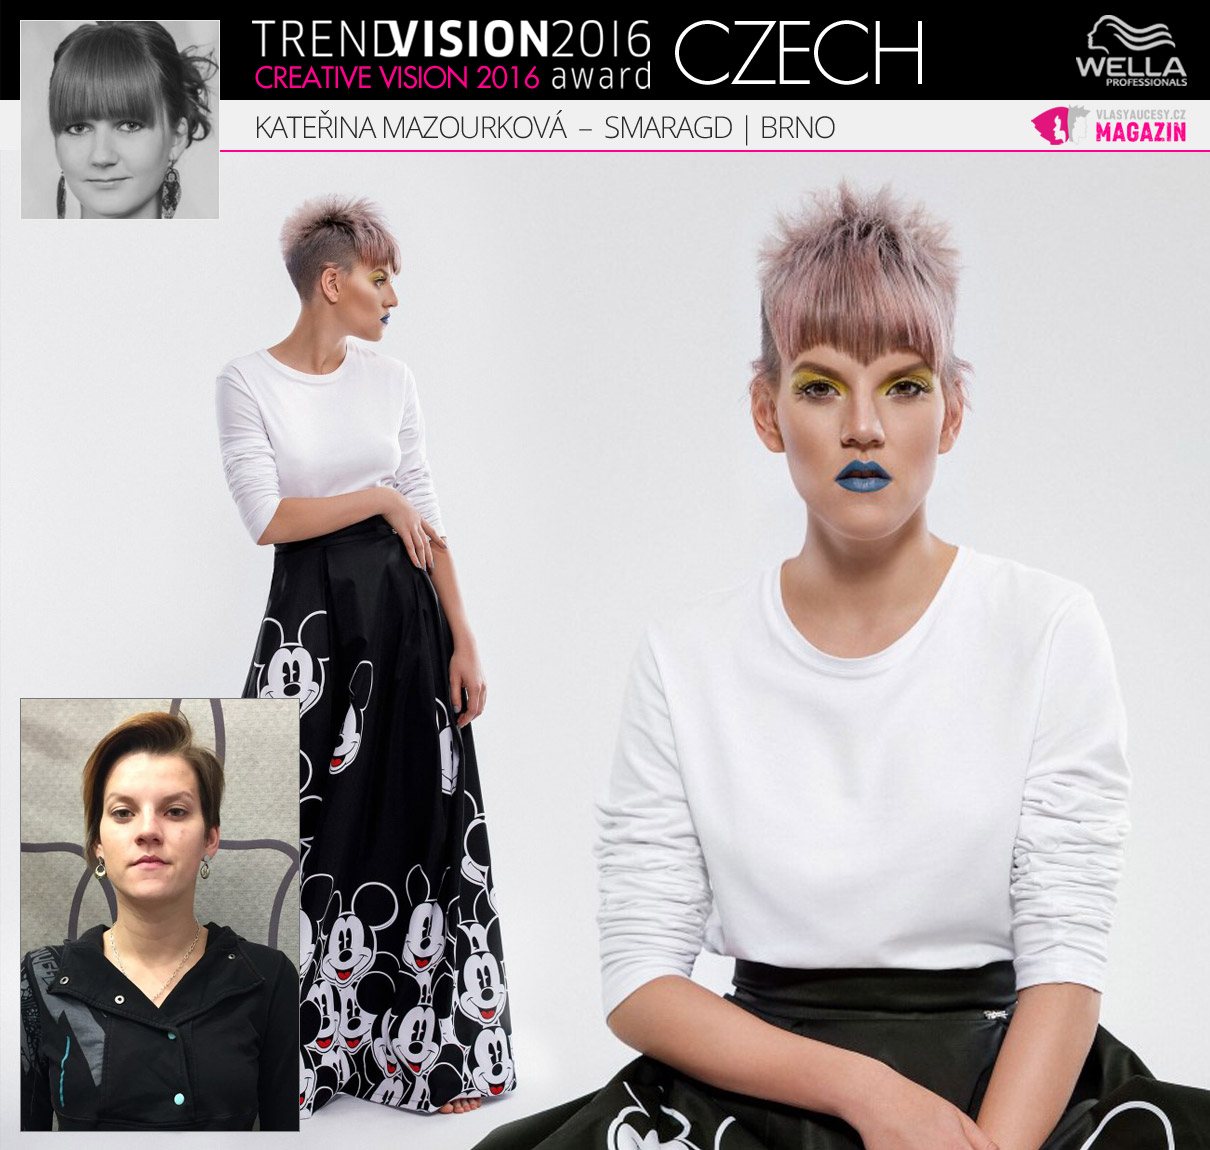 Kateřina Mazourková, Smaragd, Brno –Wella Professionals Trend Vision Award Česká republika, kategorie Creative Vision 2016.